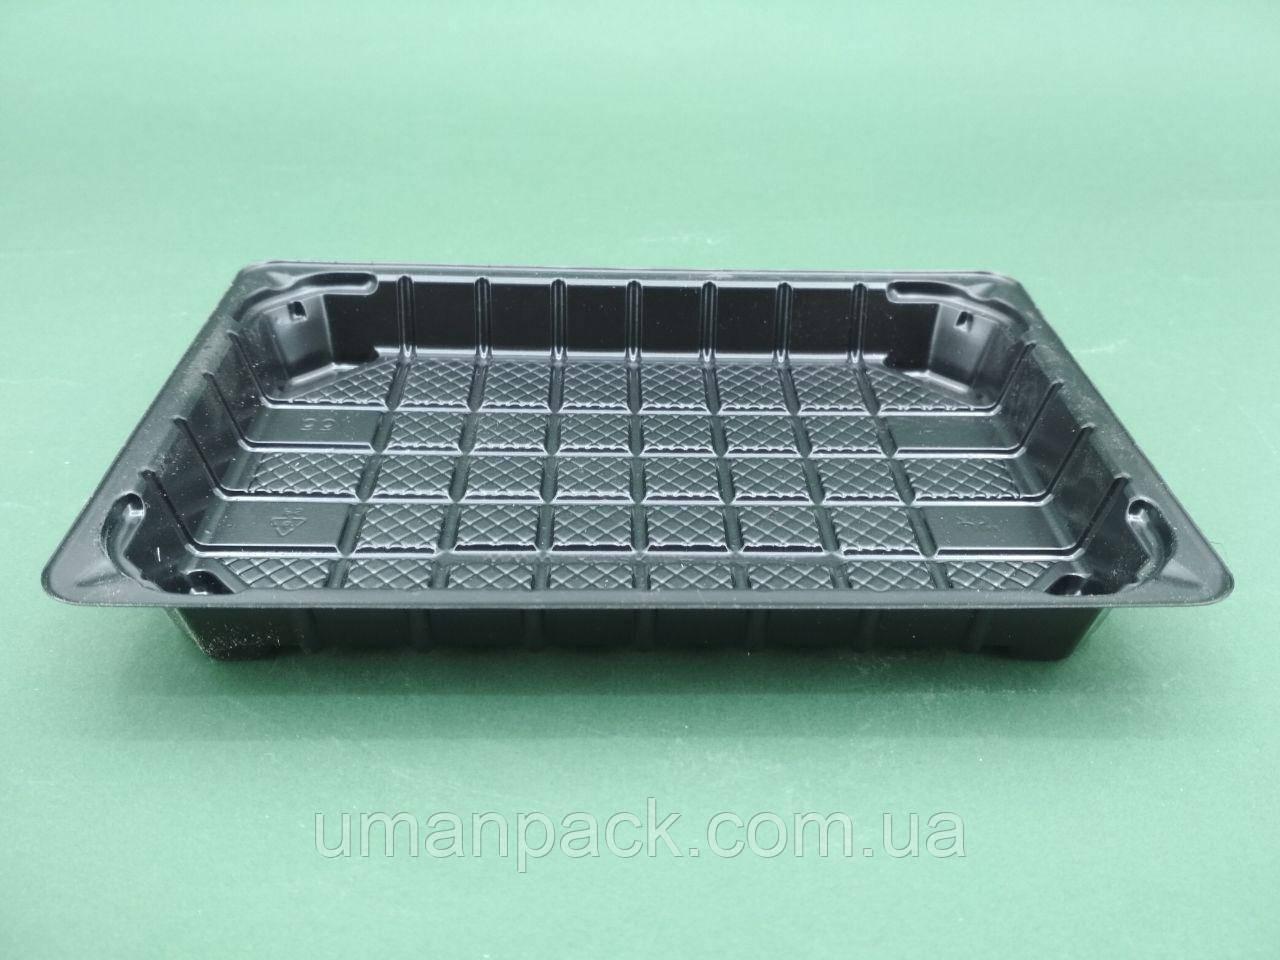 Упаковка пластиковая под суши SL331ВL 184*129*22 (50 шт)